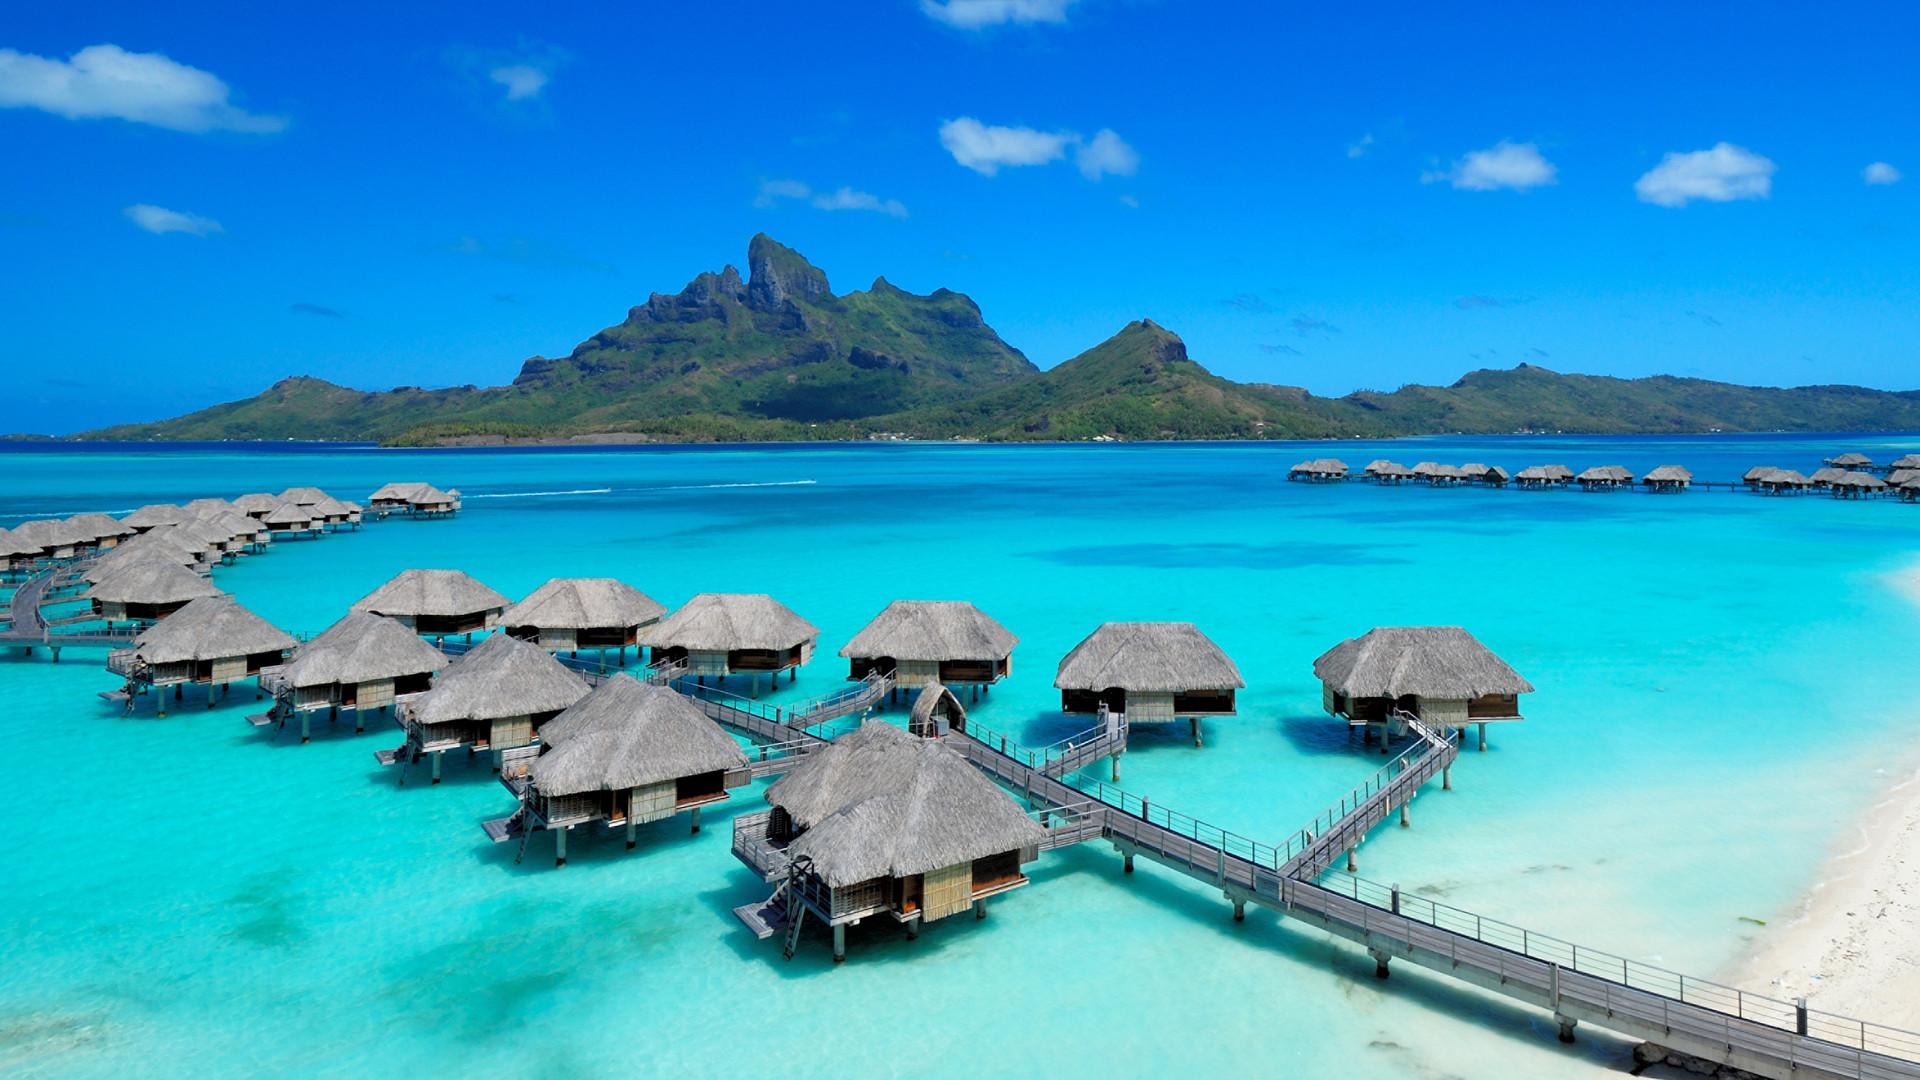 Four_Seasons_Resort_Bora_Bora-Overwater_Bungalows